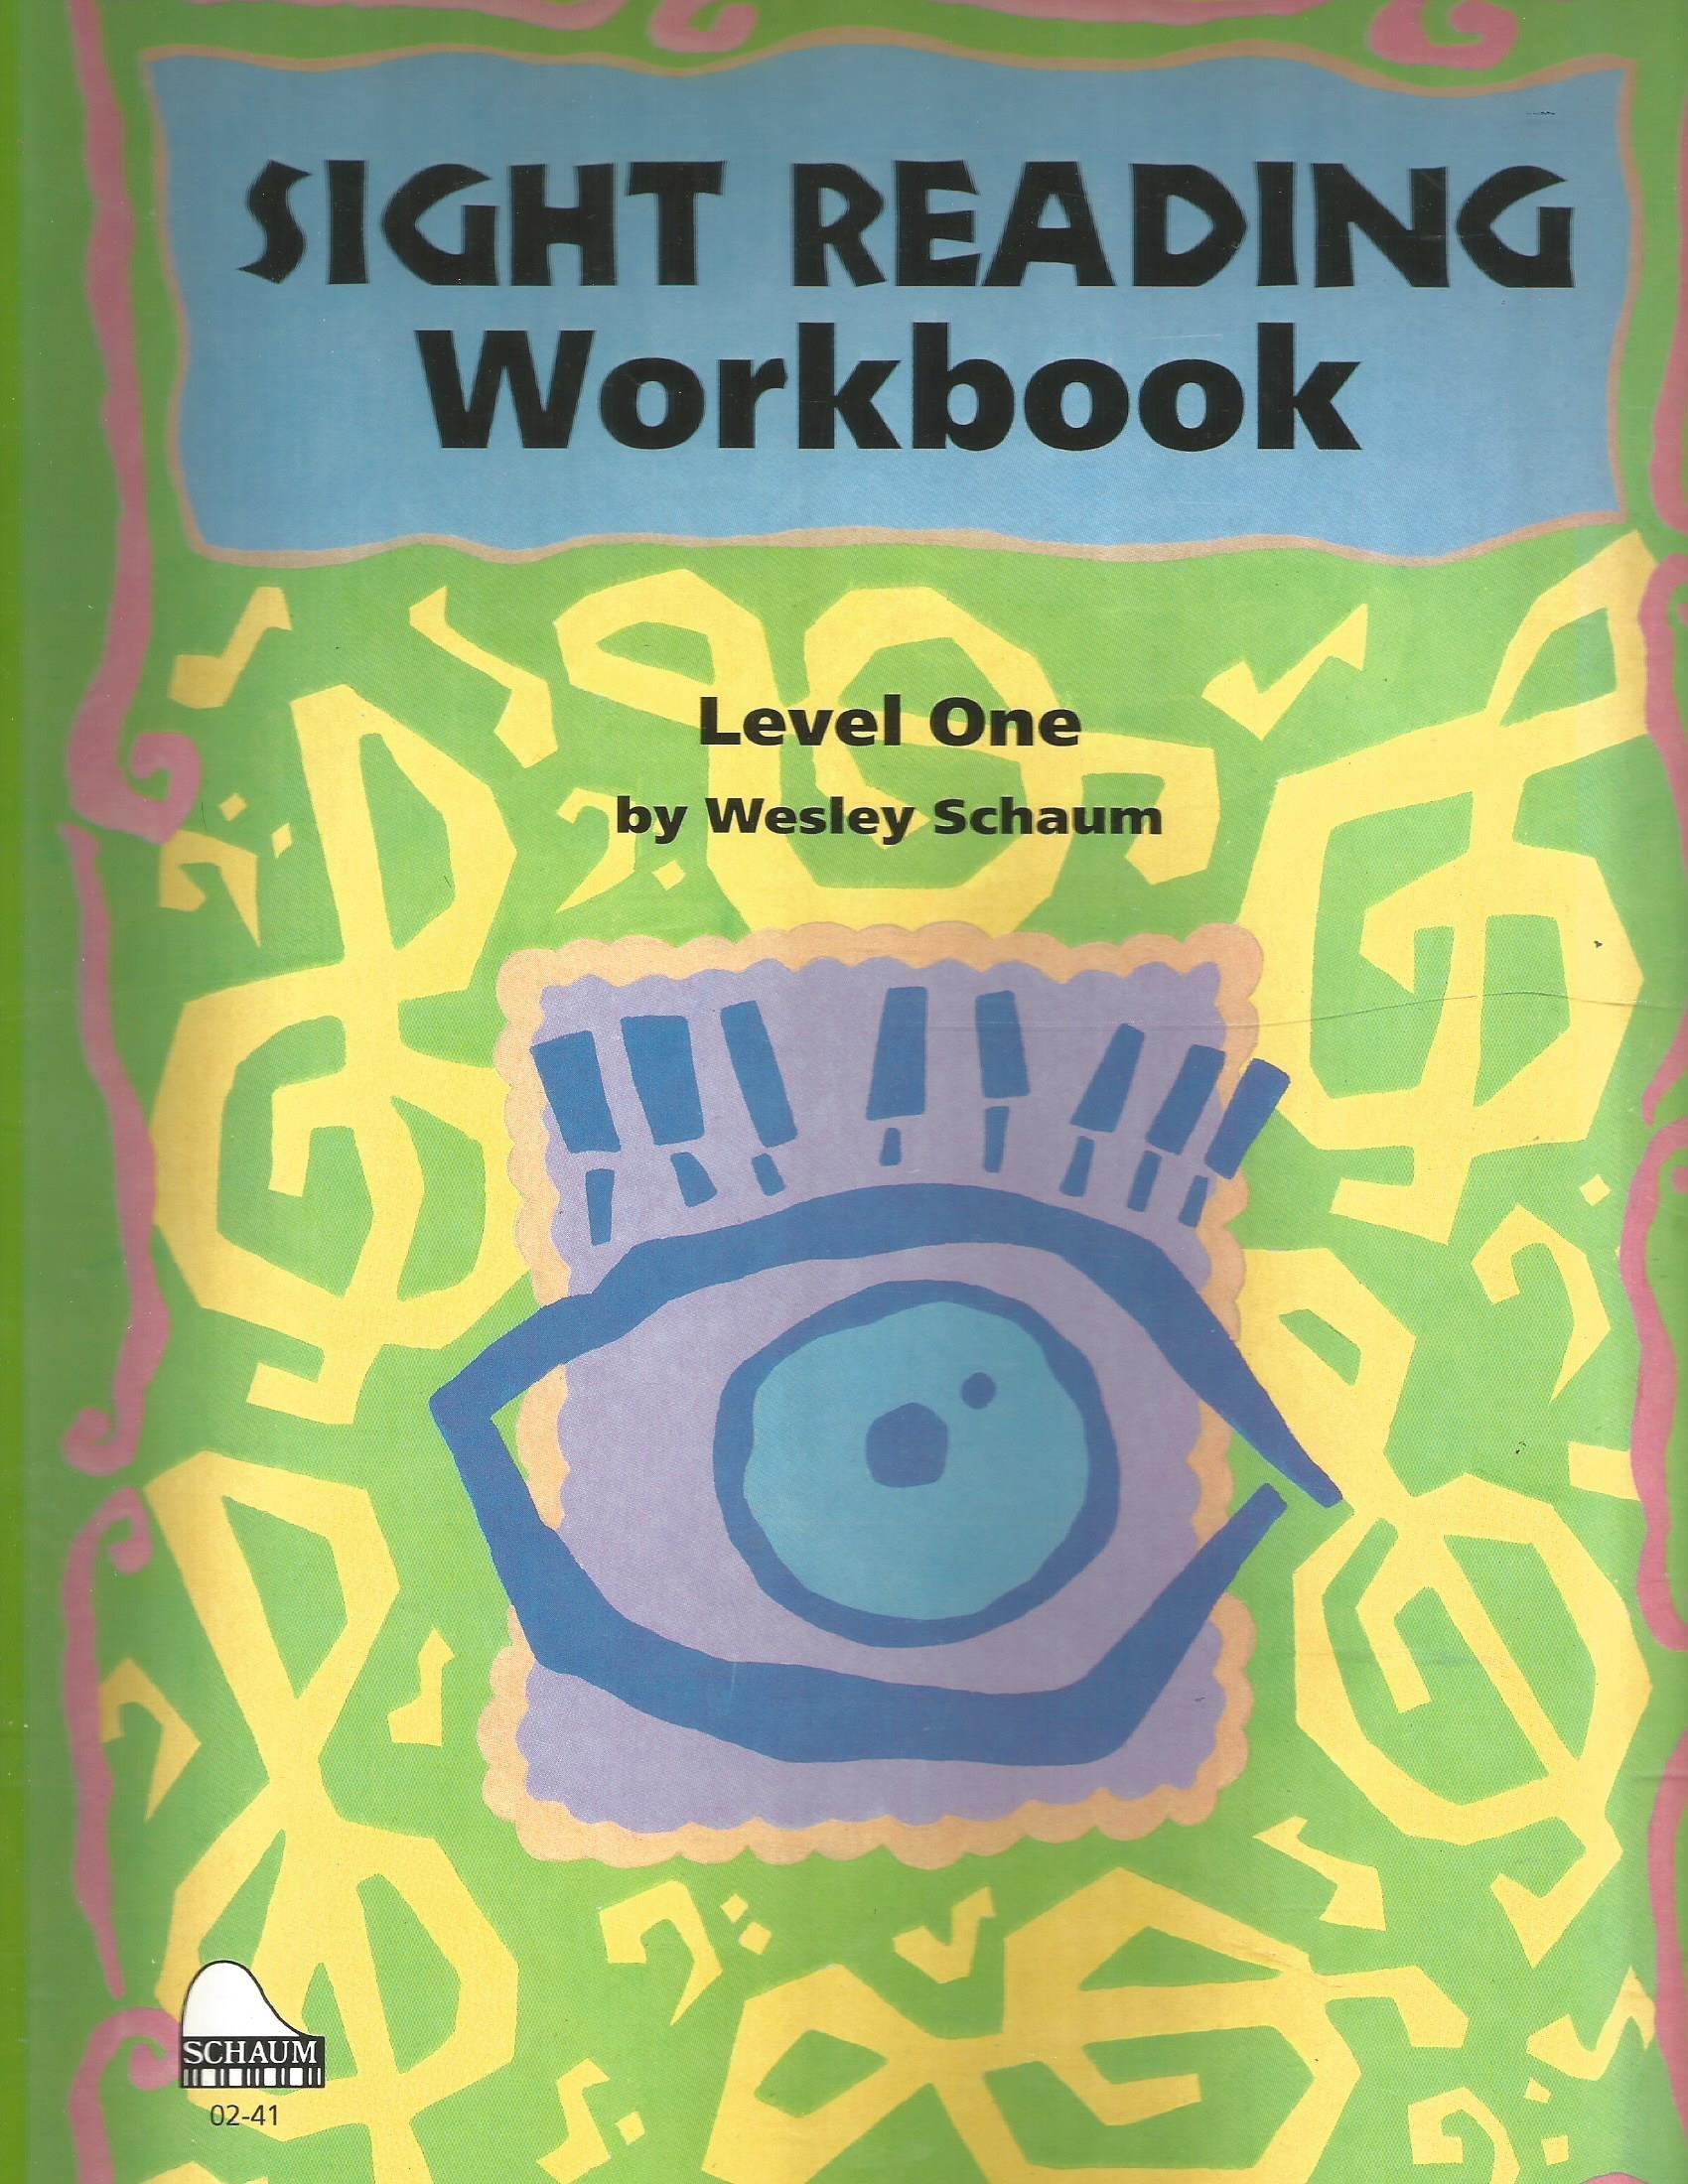 Sight Reading Workbook: Level 1 (Schaum Publications Sight Reading Workbook)